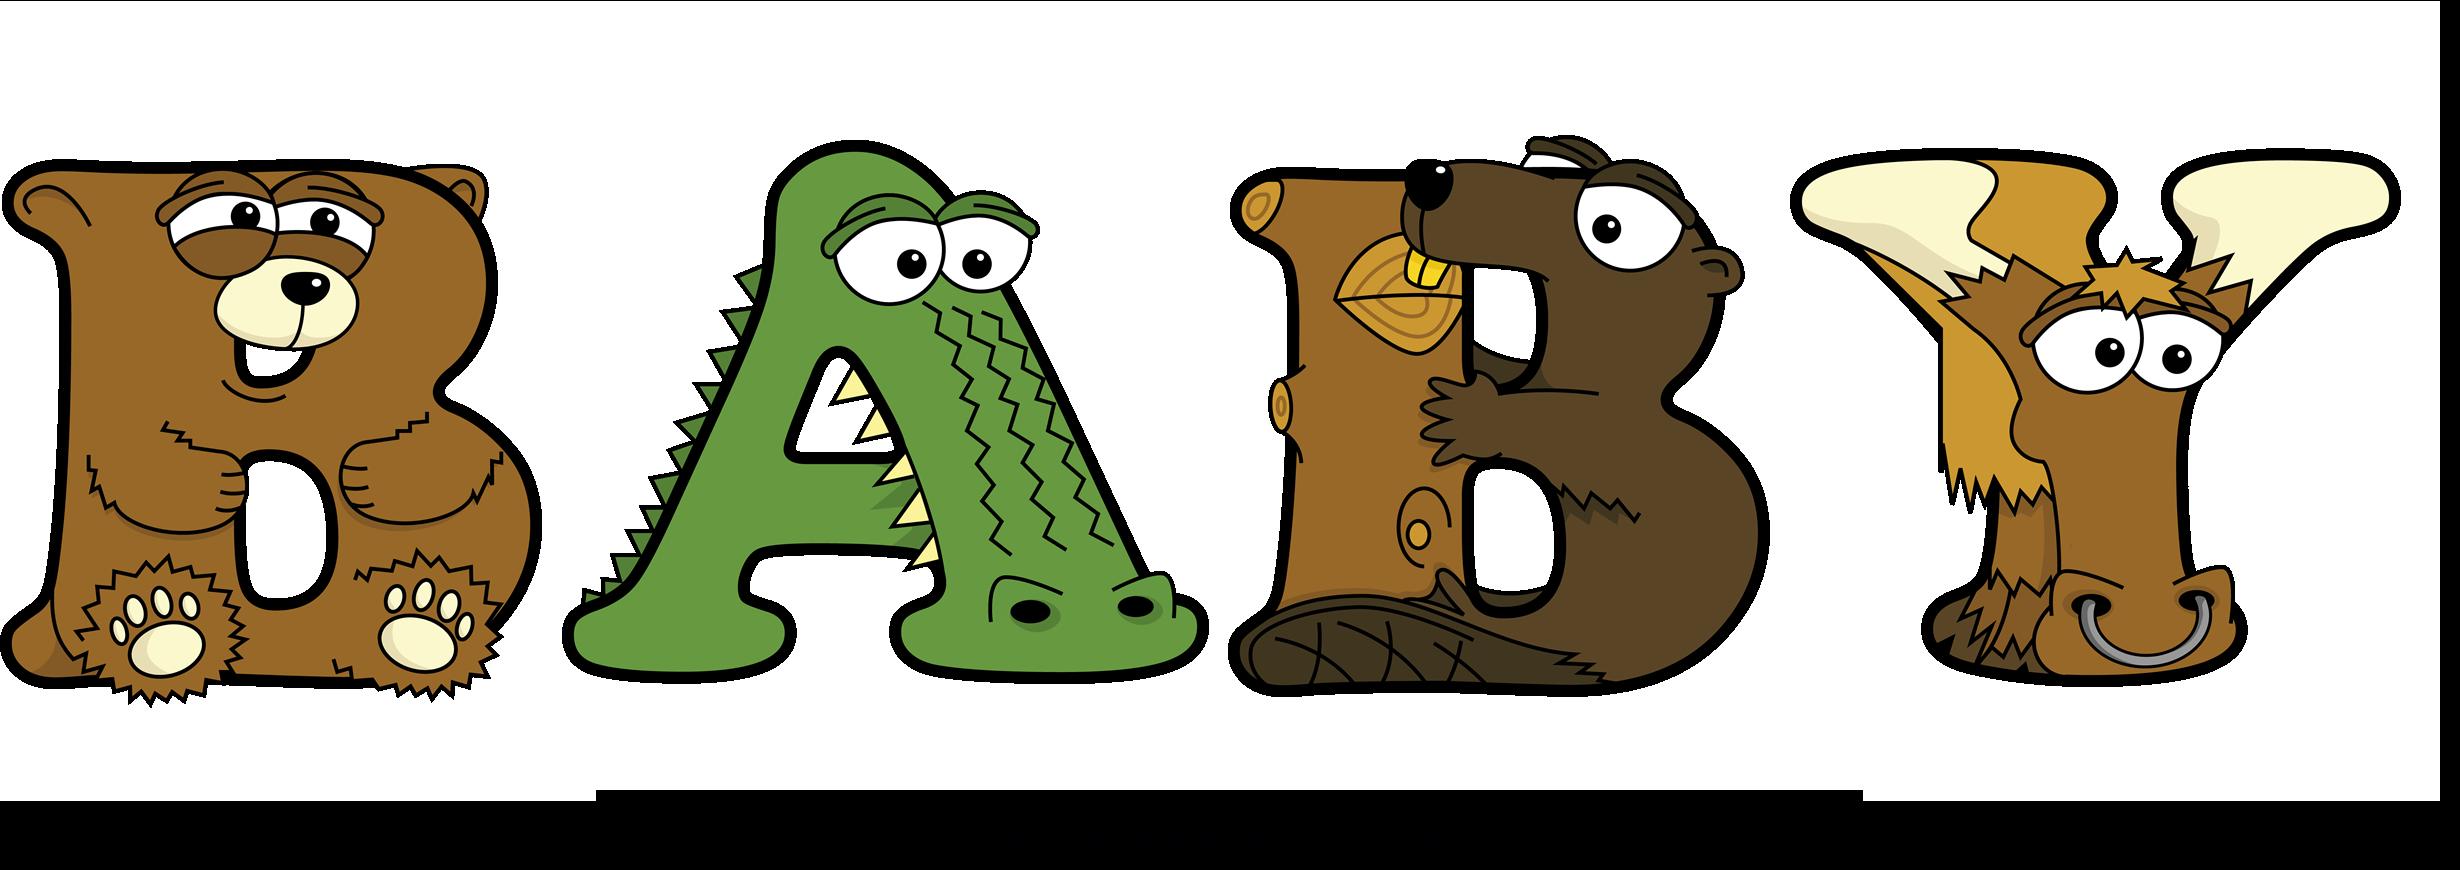 The word BABY written in cute cartoon animal drawings